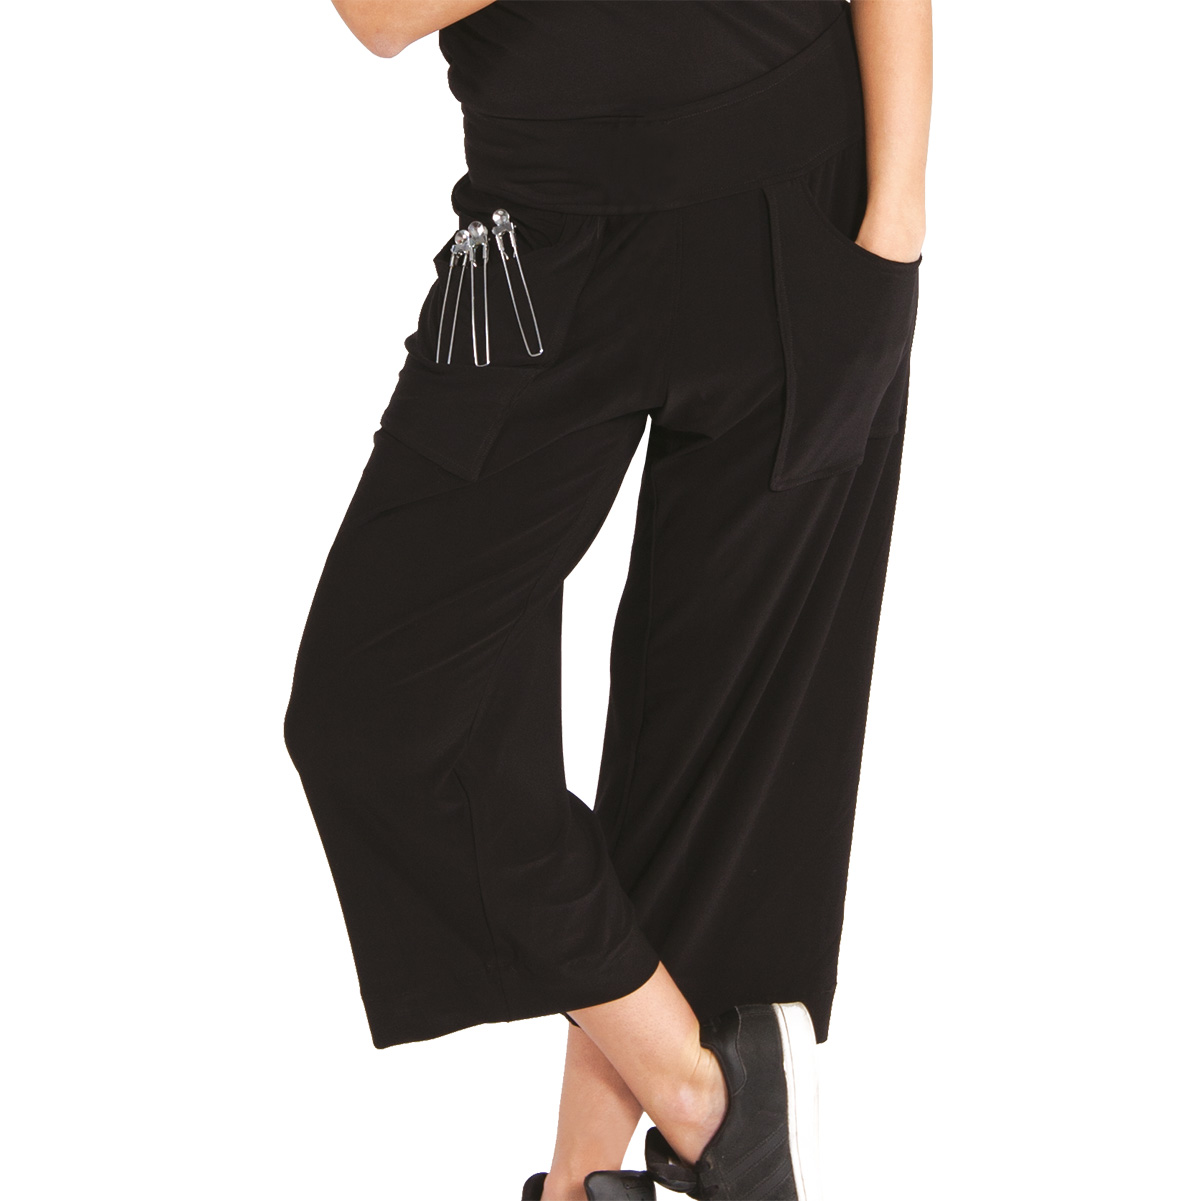 trendy-pantalone-polpaccio